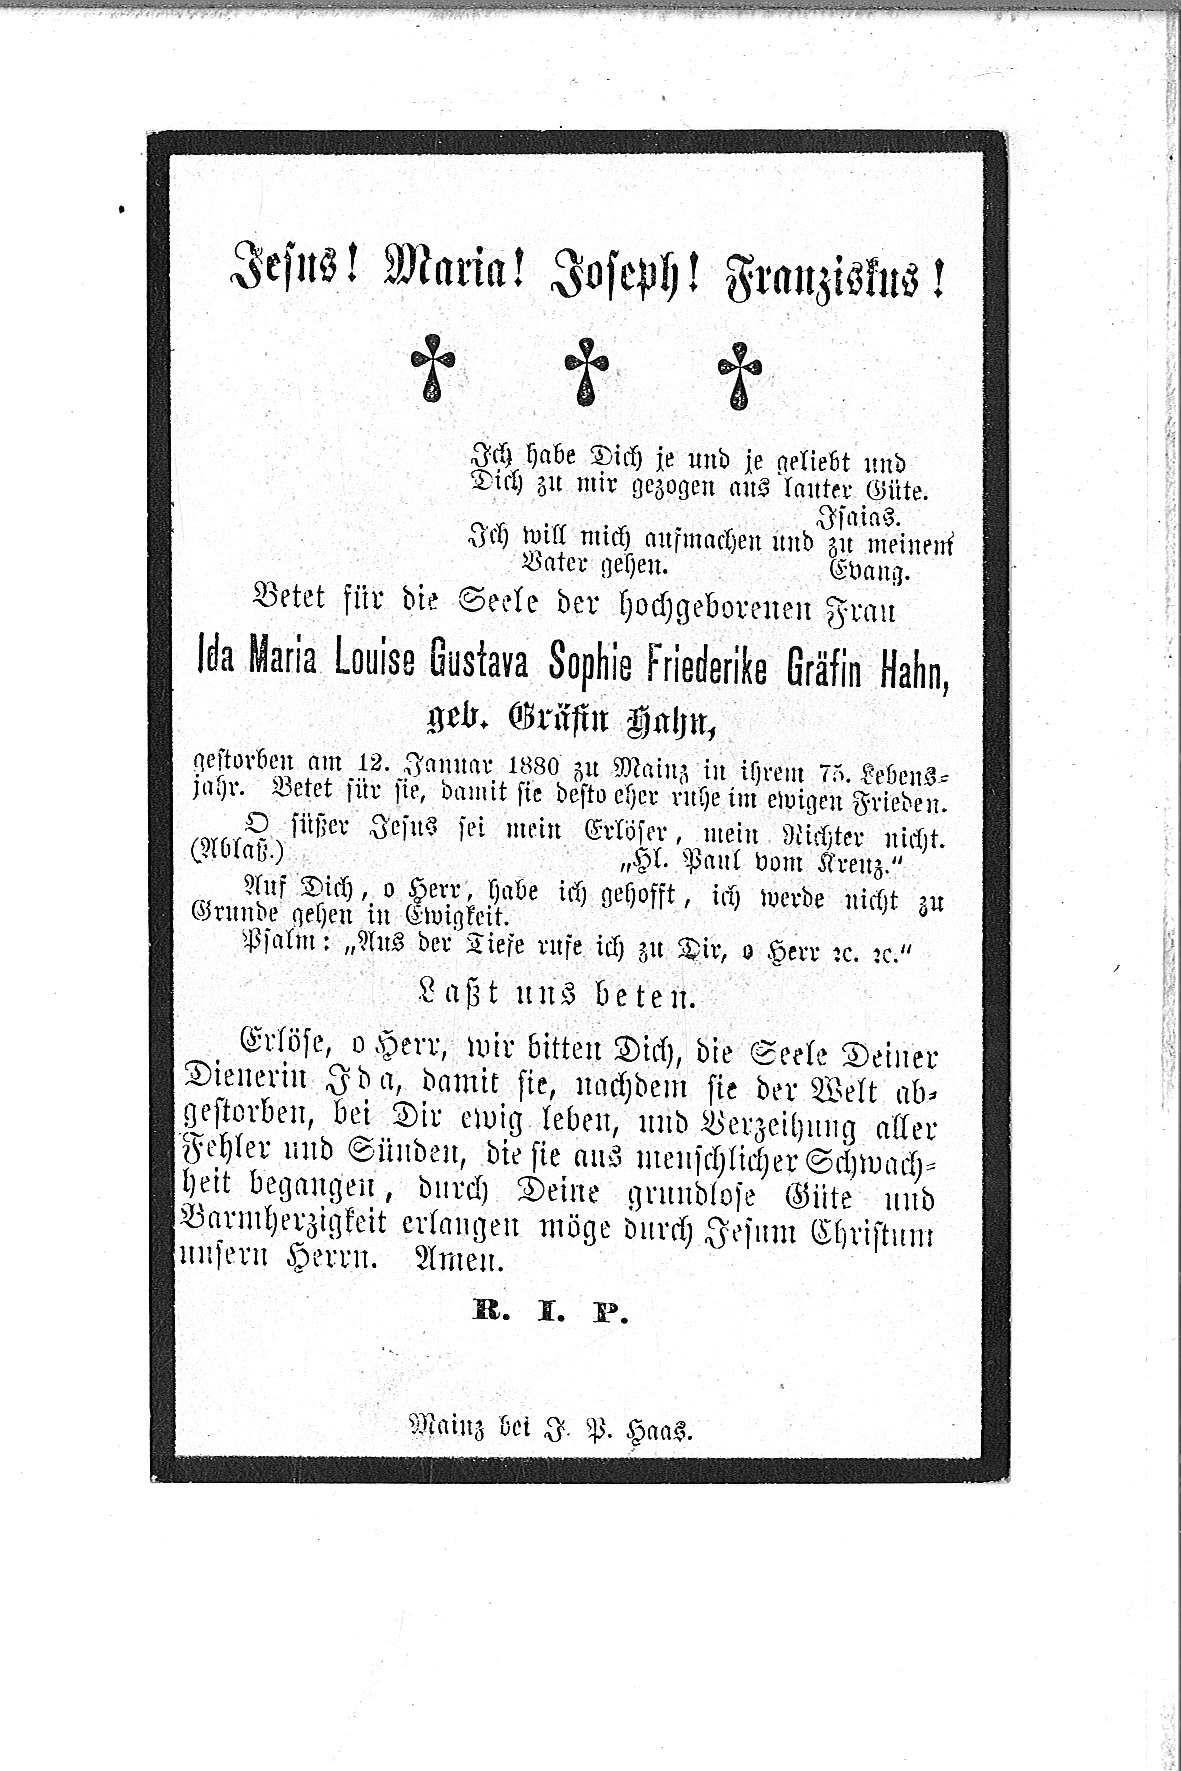 Ida-Maria-Louisa-Gustava-Sophie-Frederike-(1880)-20121116115219_00093.jpg